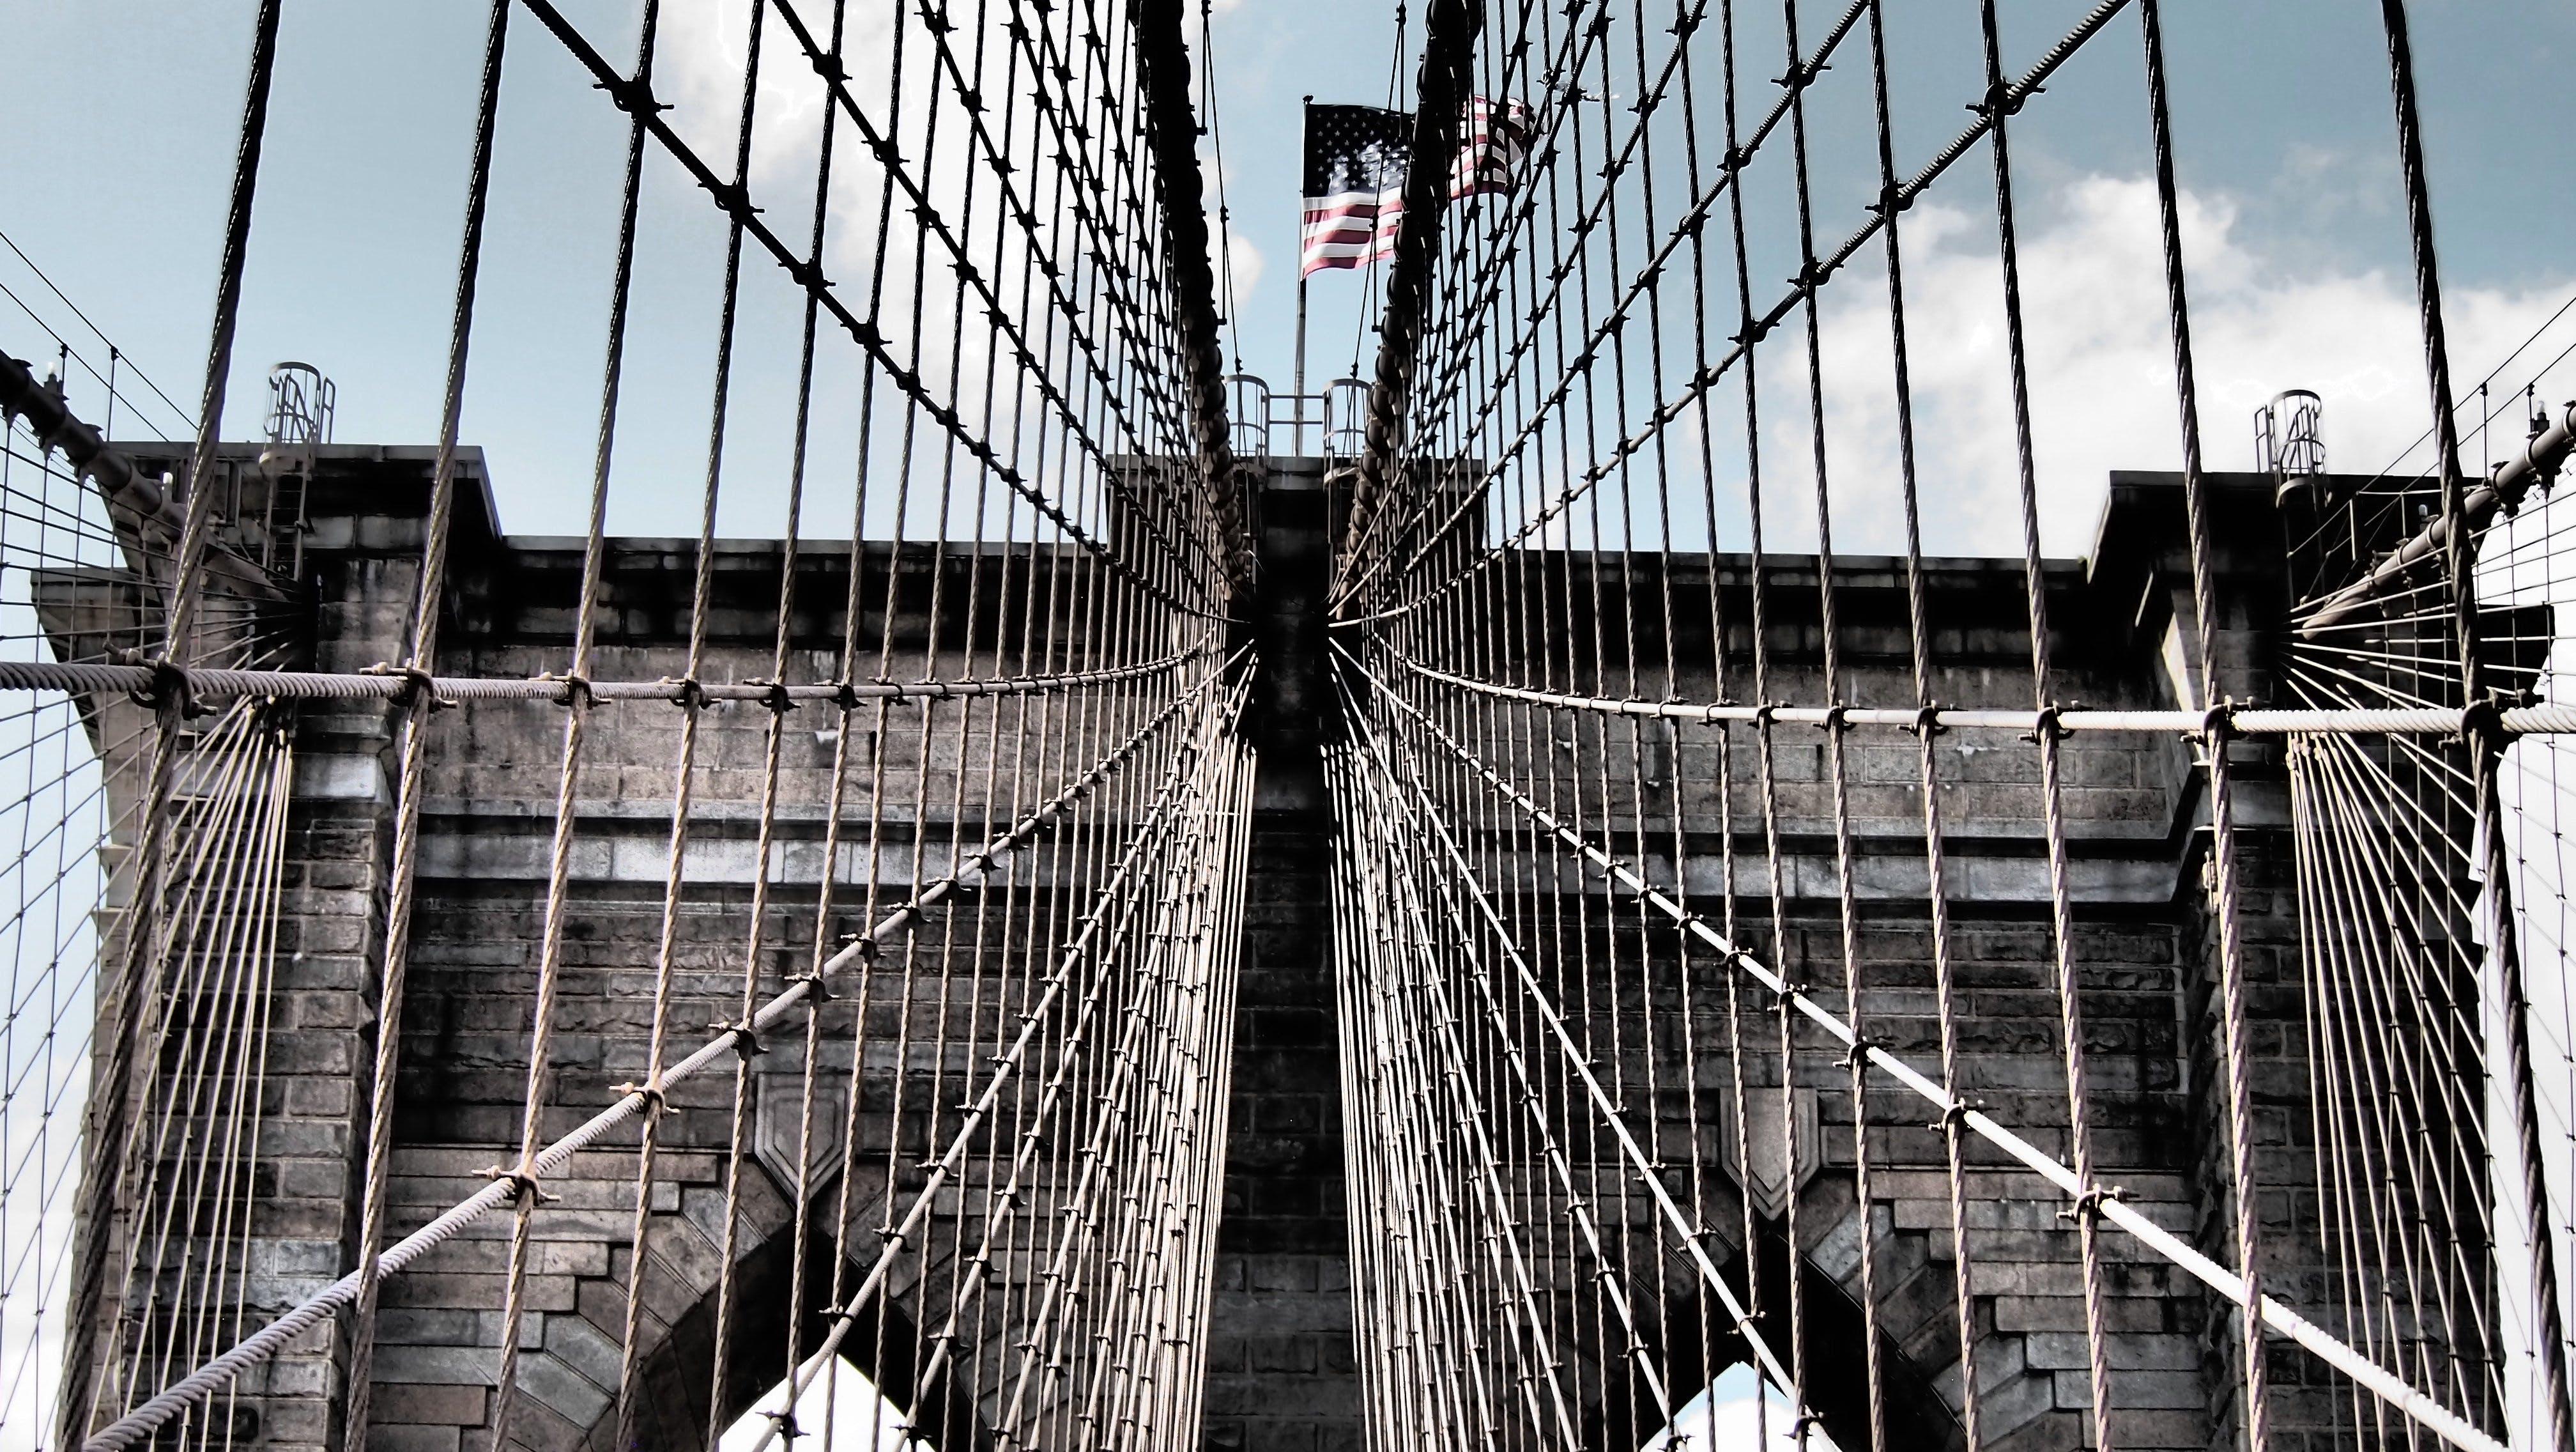 Kostenloses Stock Foto zu new york, brücke, architektur, brooklyn brücke